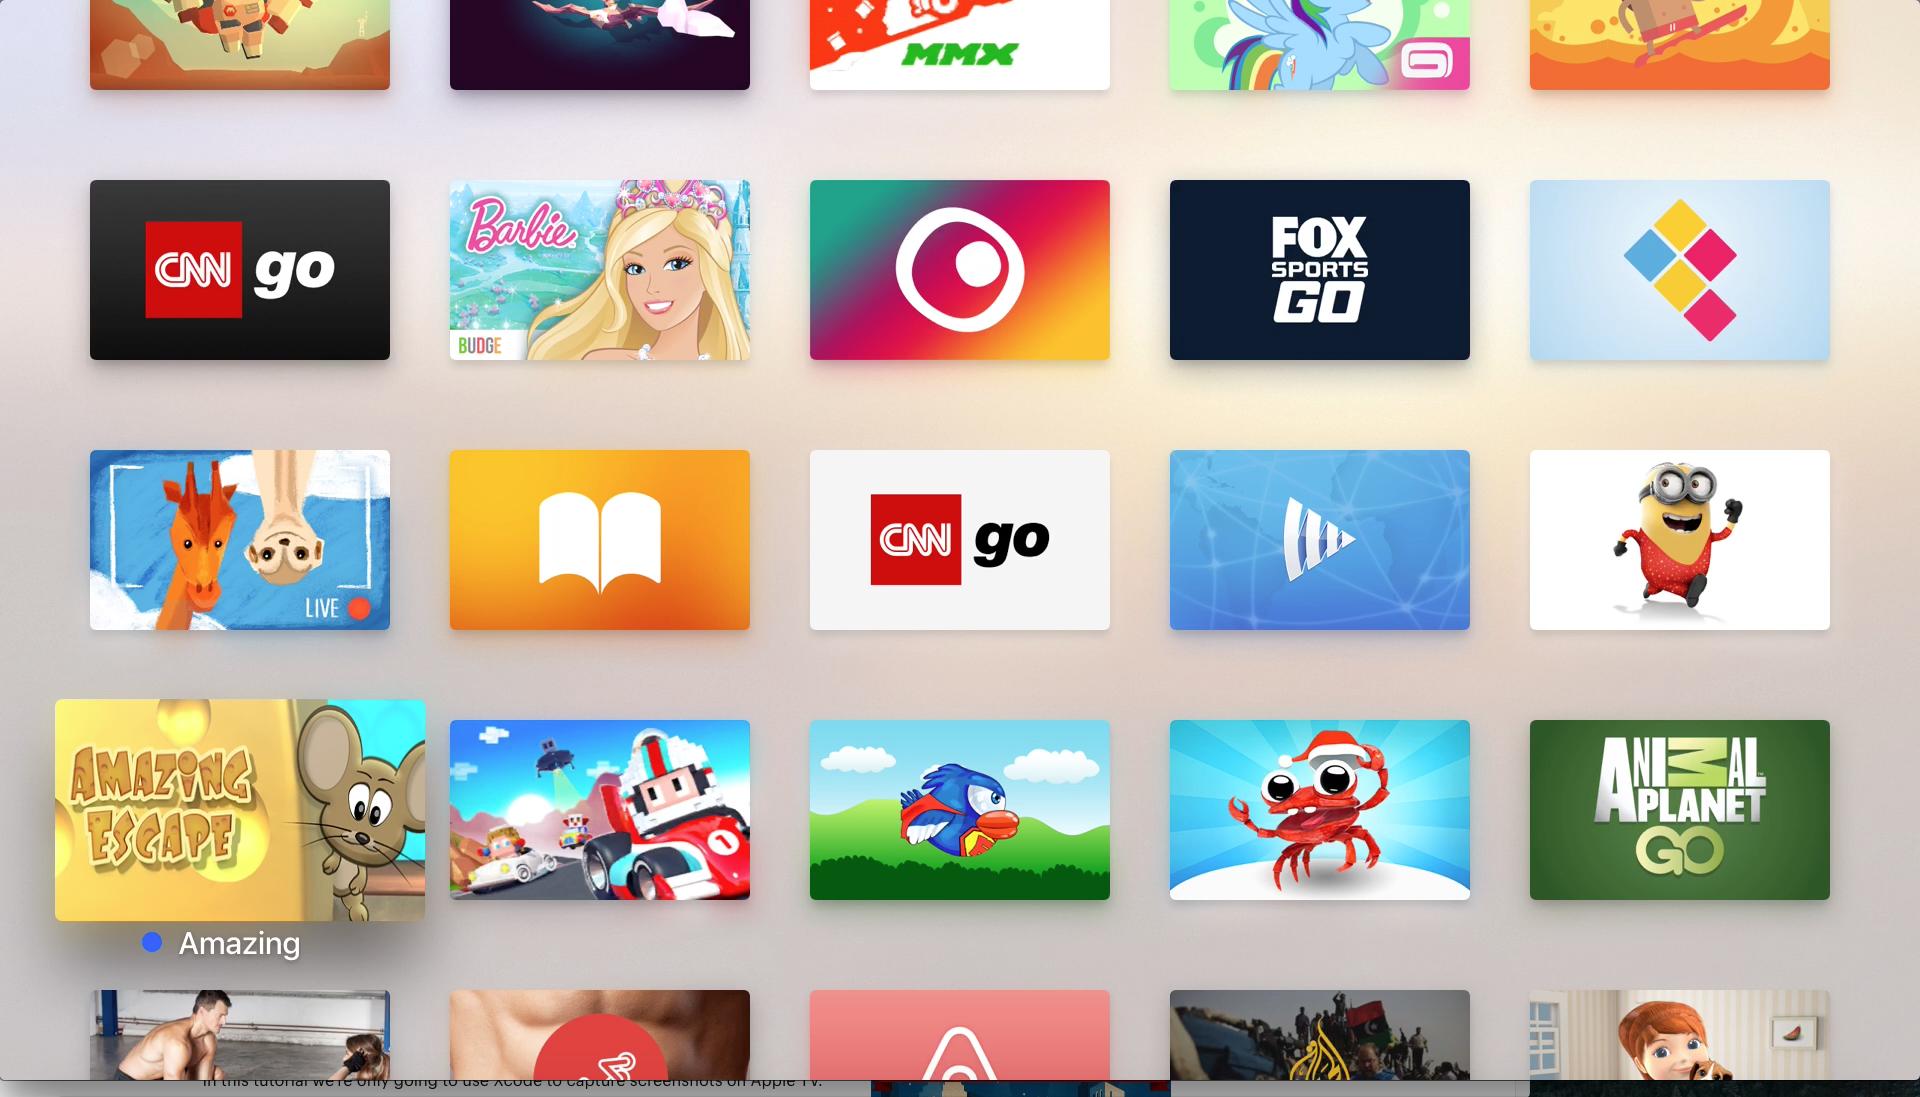 Apple TV Apps | Apple TV (tvOS) UI/UX & App Icon Designs